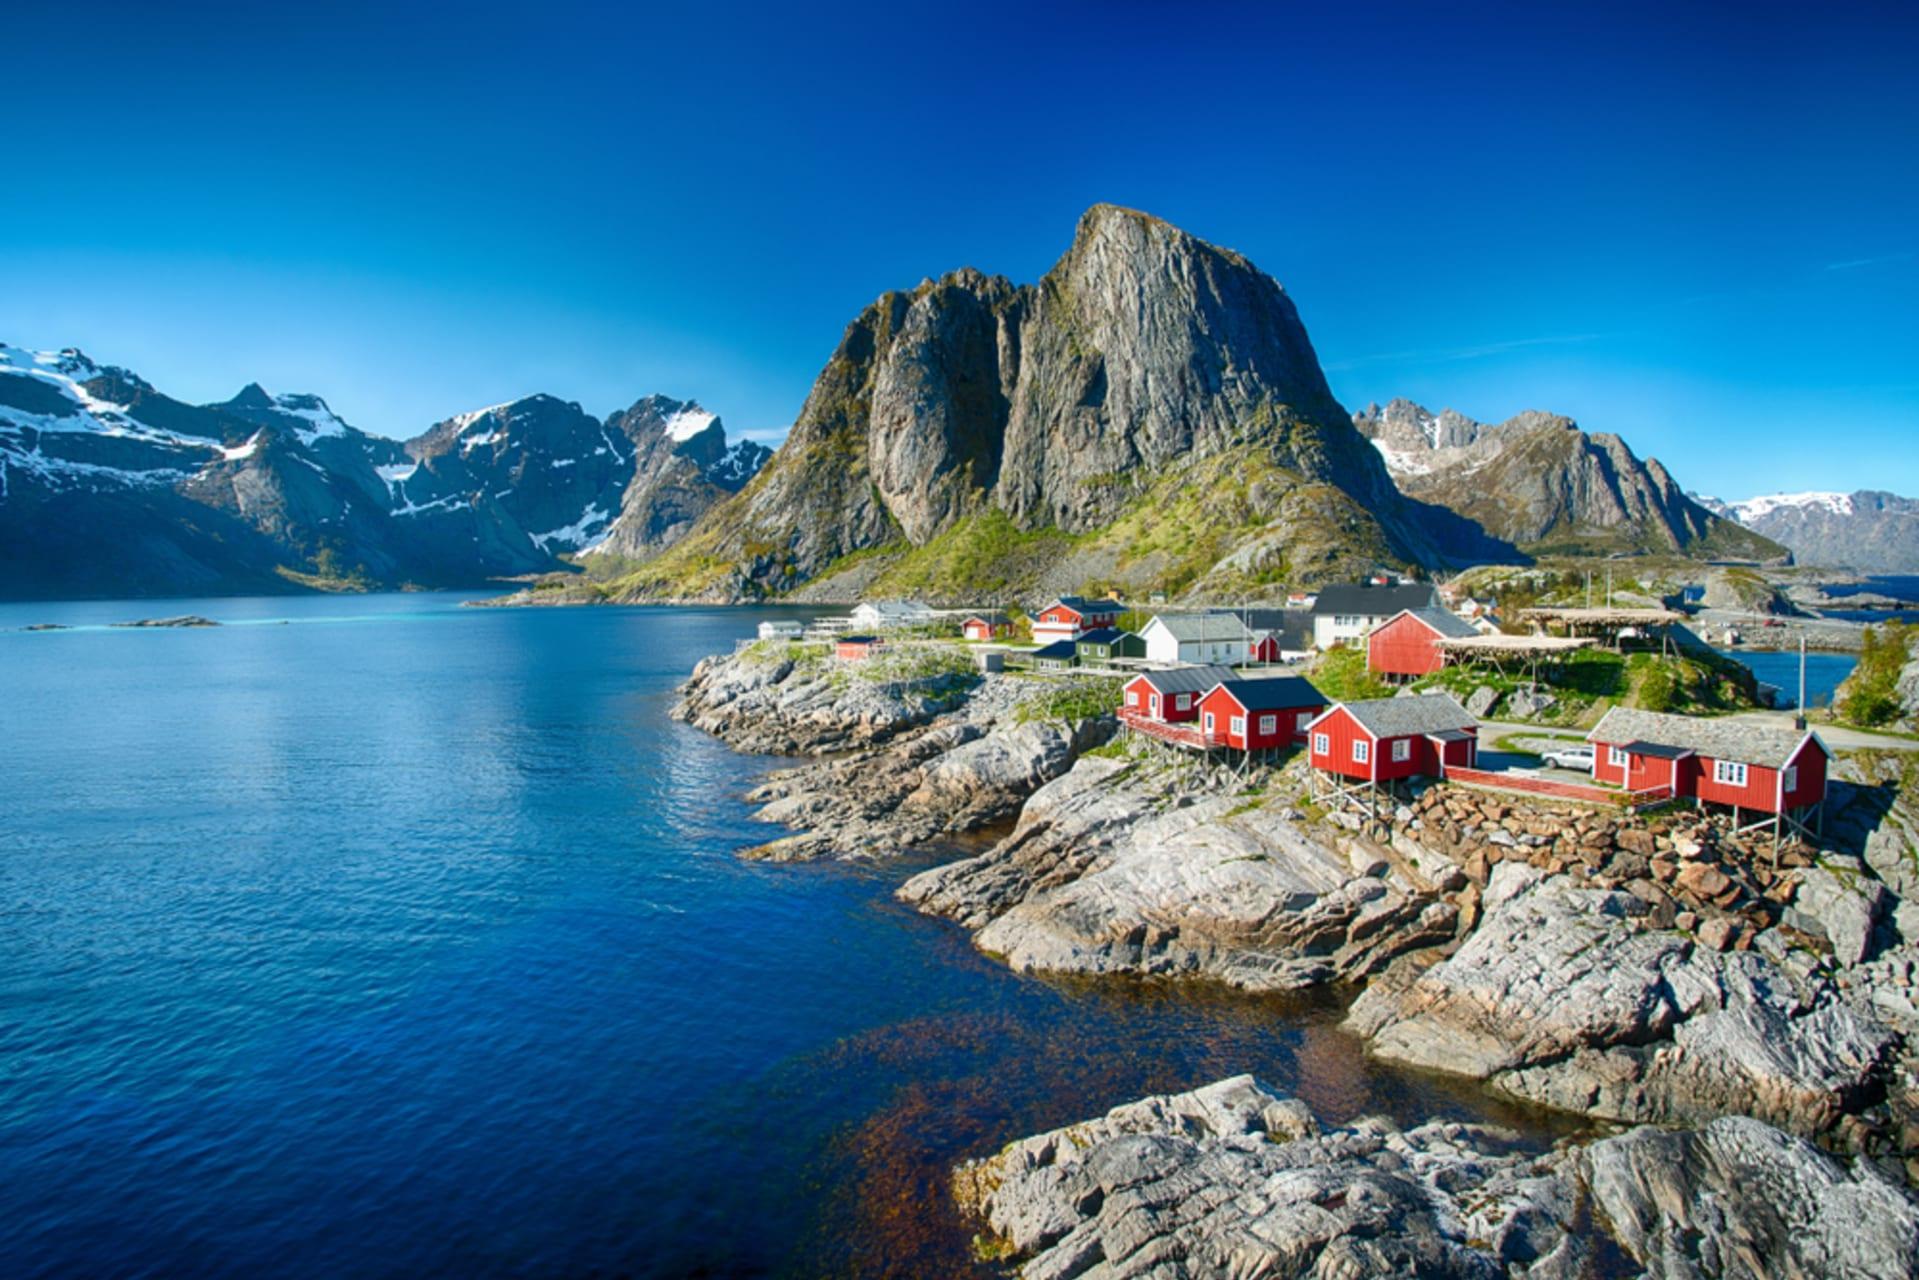 Lofoten Islands -  The Lofoten Islands: Norway's Most Beautiful Archipelago